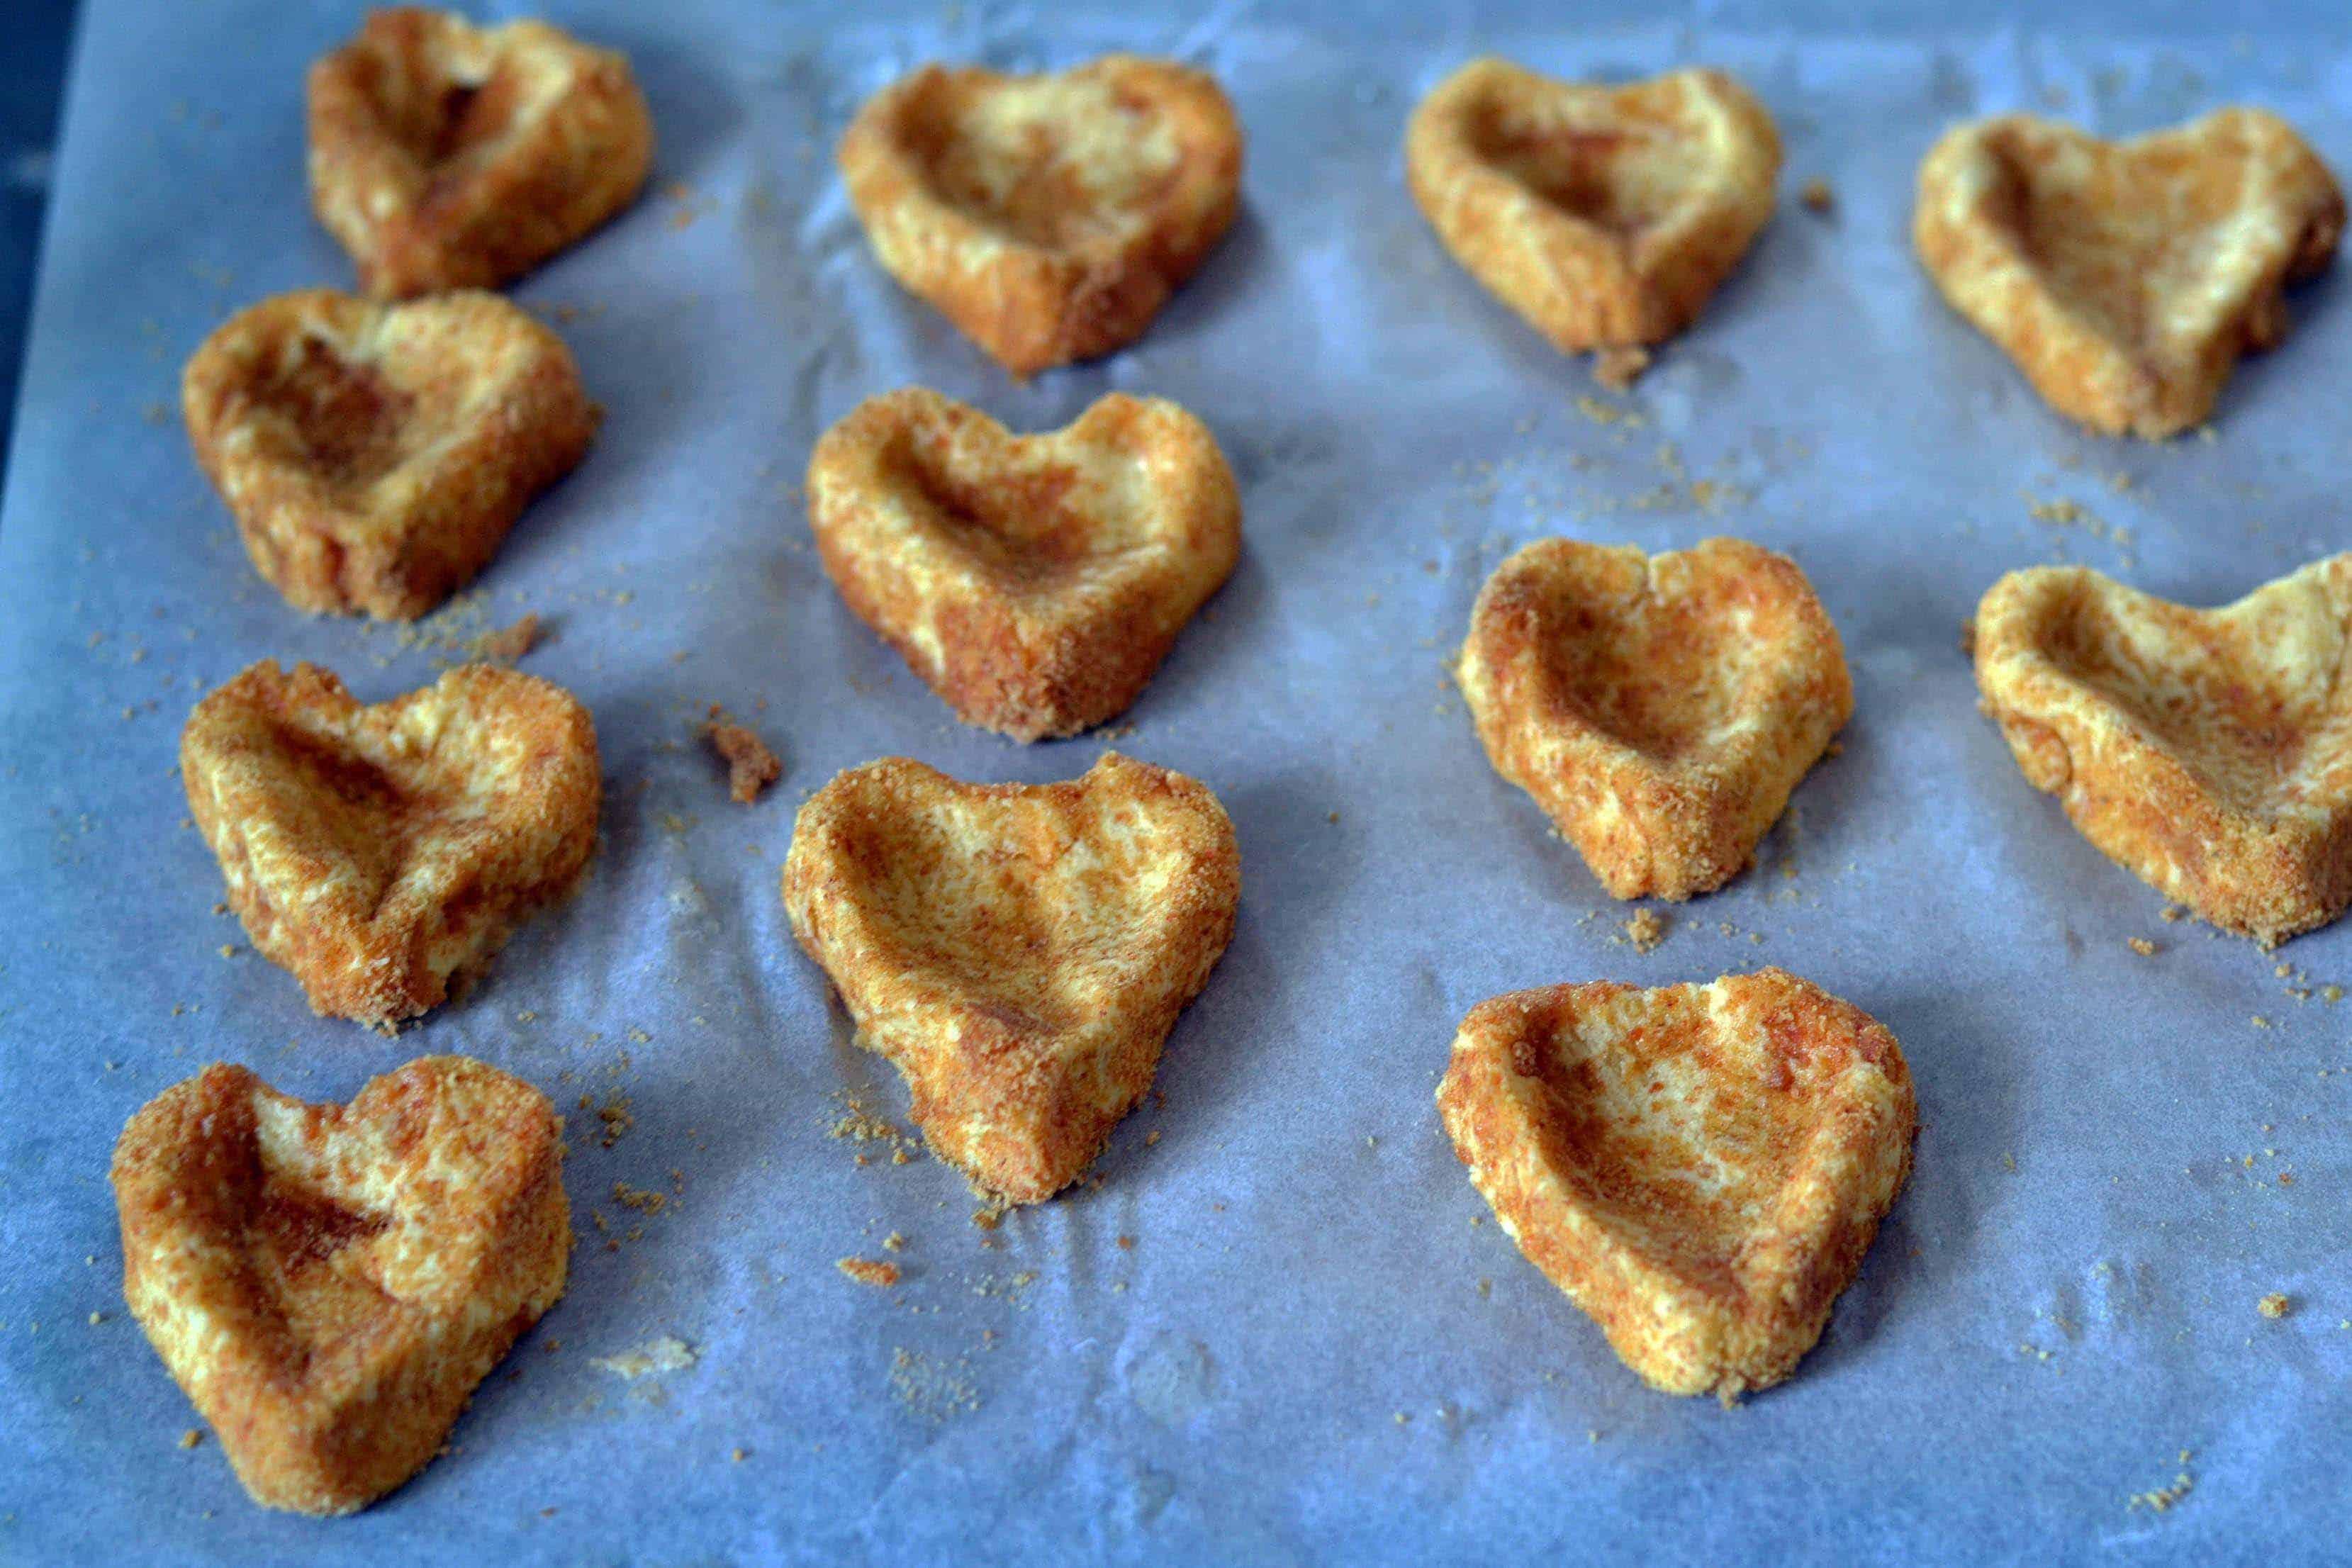 homemade graham cookies shaped like hearts